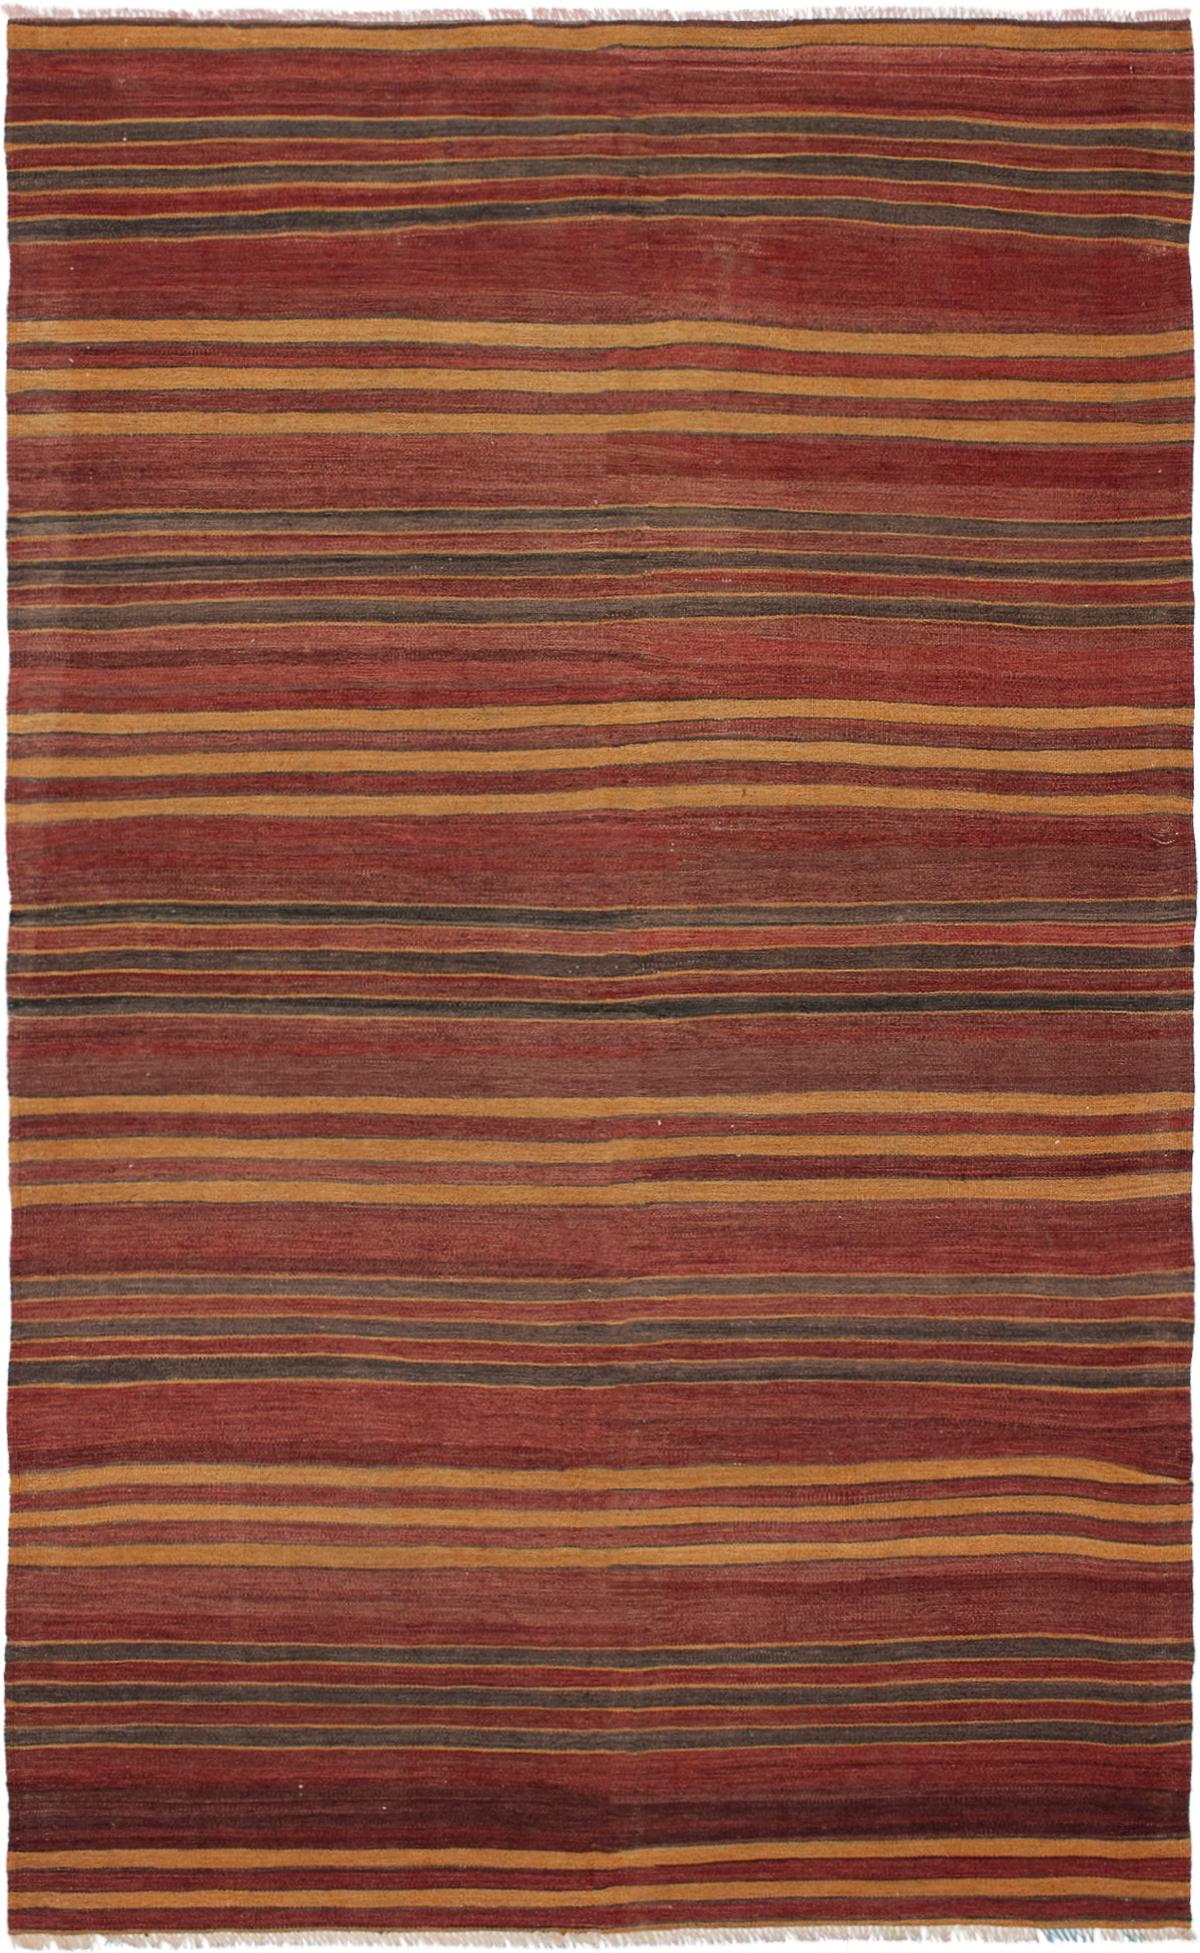 "Hand woven Bohemian Dark Red Wool Kilim 5'3"" x 8'11"" Size: 5'3"" x 8'11"""